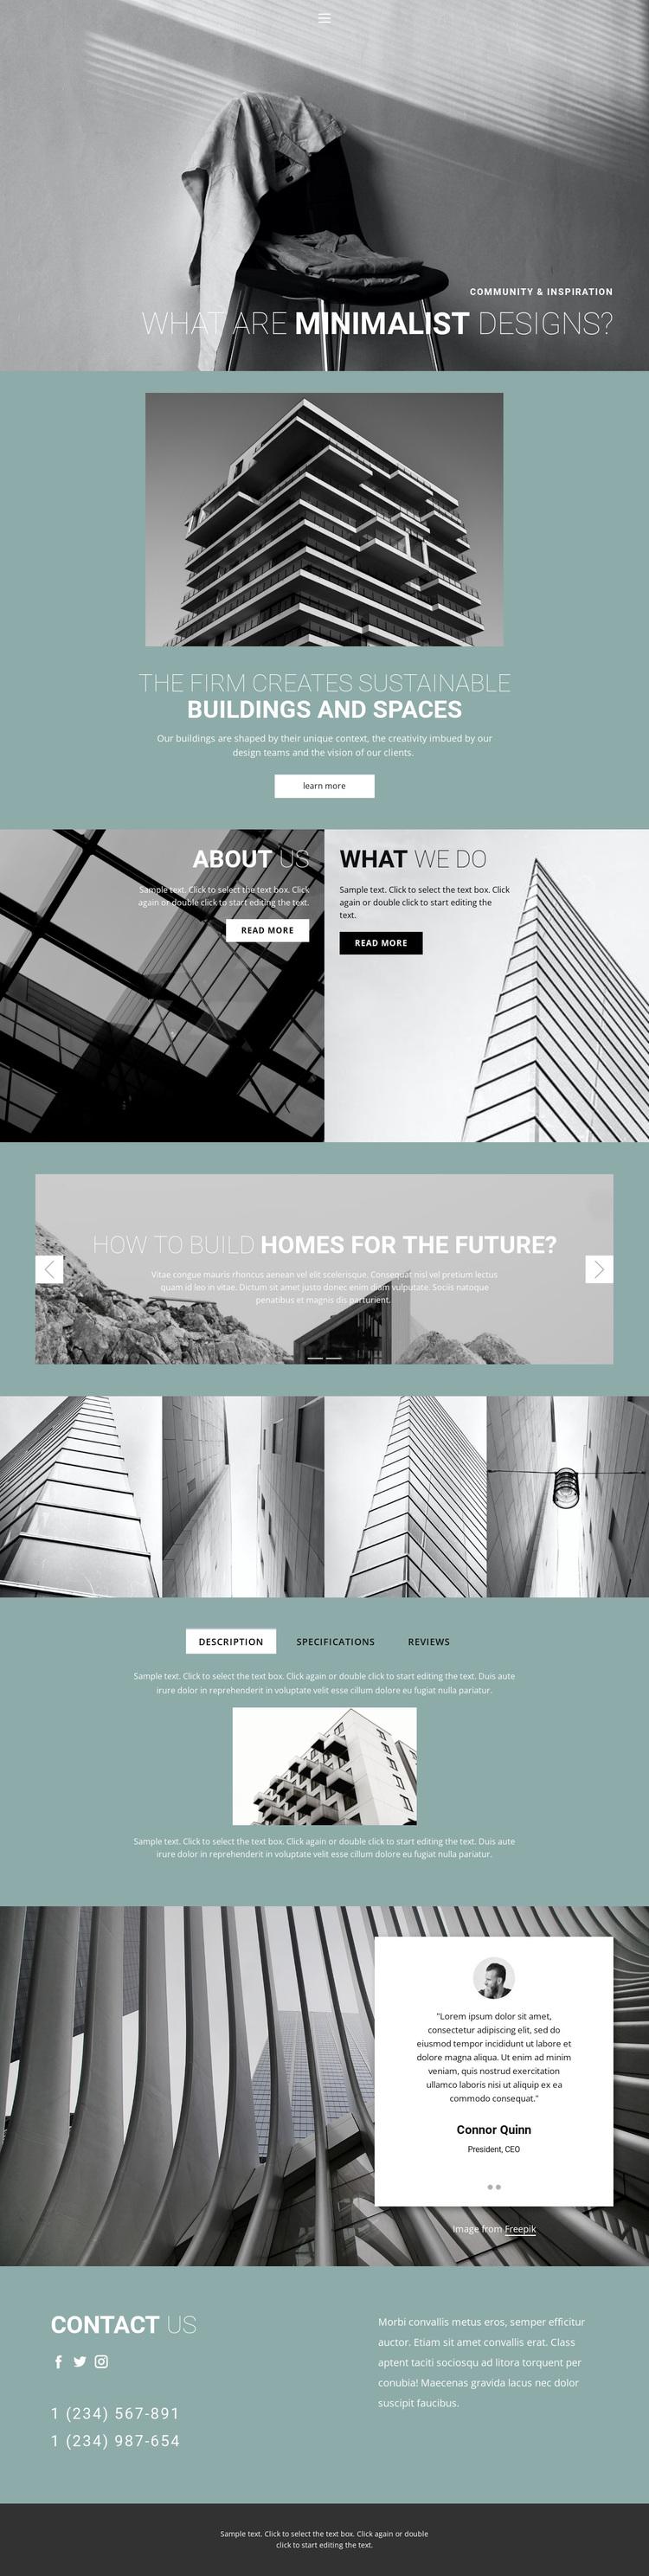 Perfect architecture ideas Template